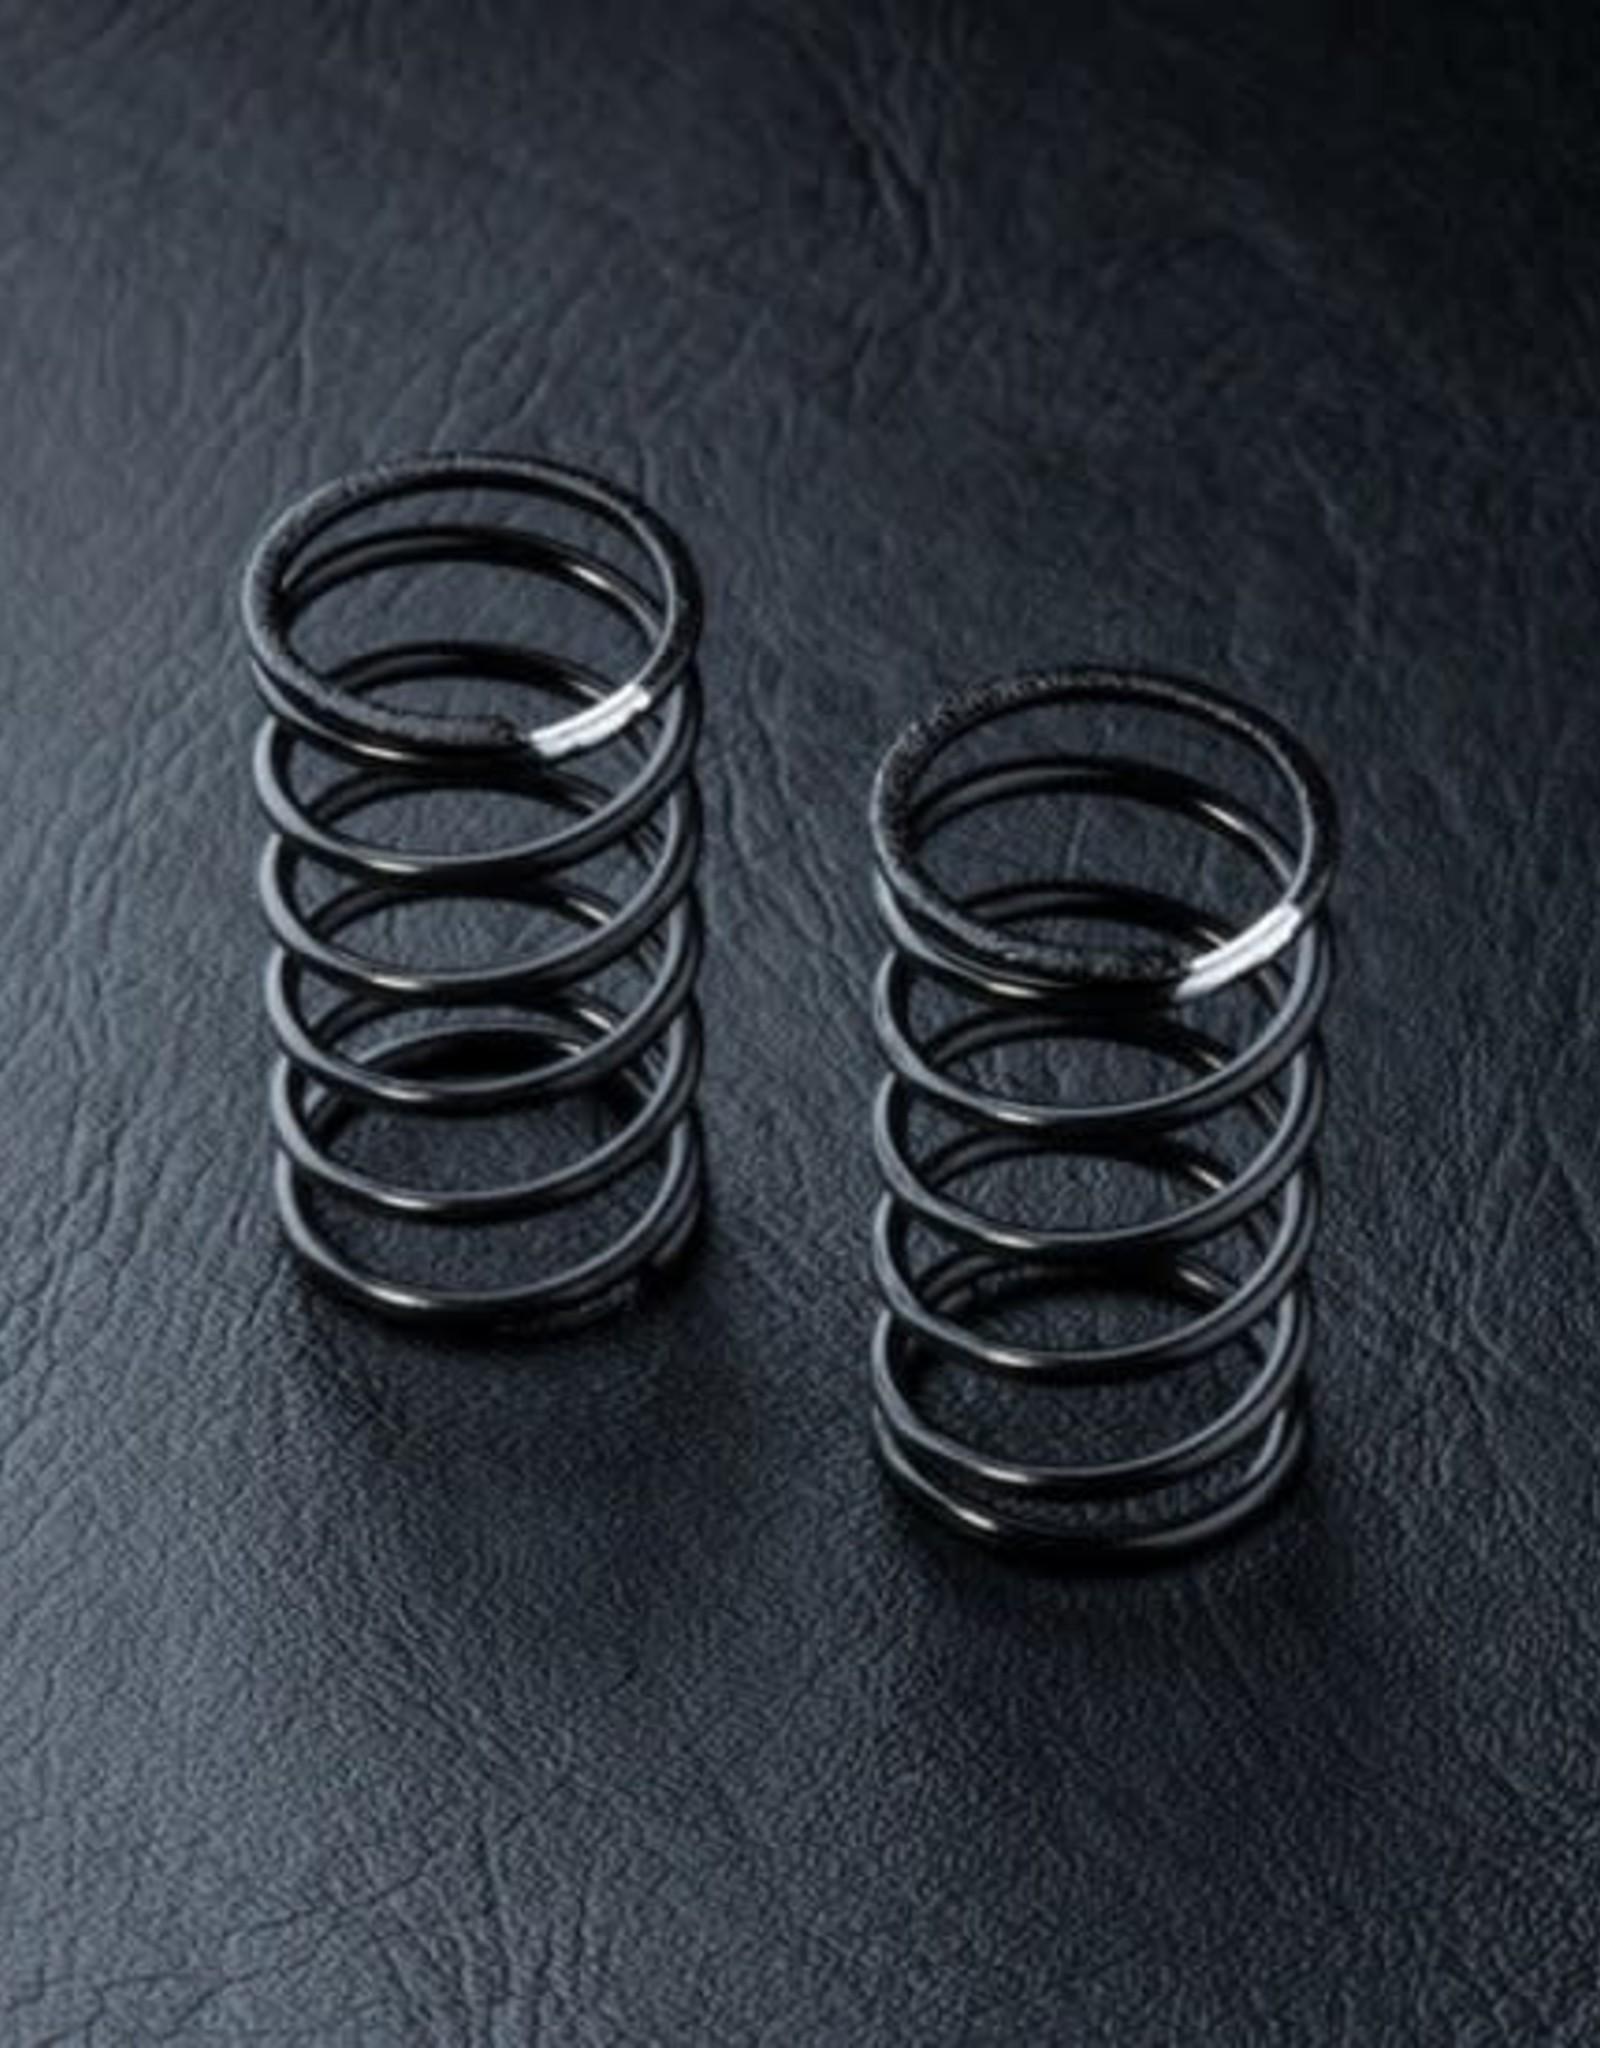 MST MXSPD210377-2 Hard coil spring 32mm (medium) (silver) (2) by MST210377-2